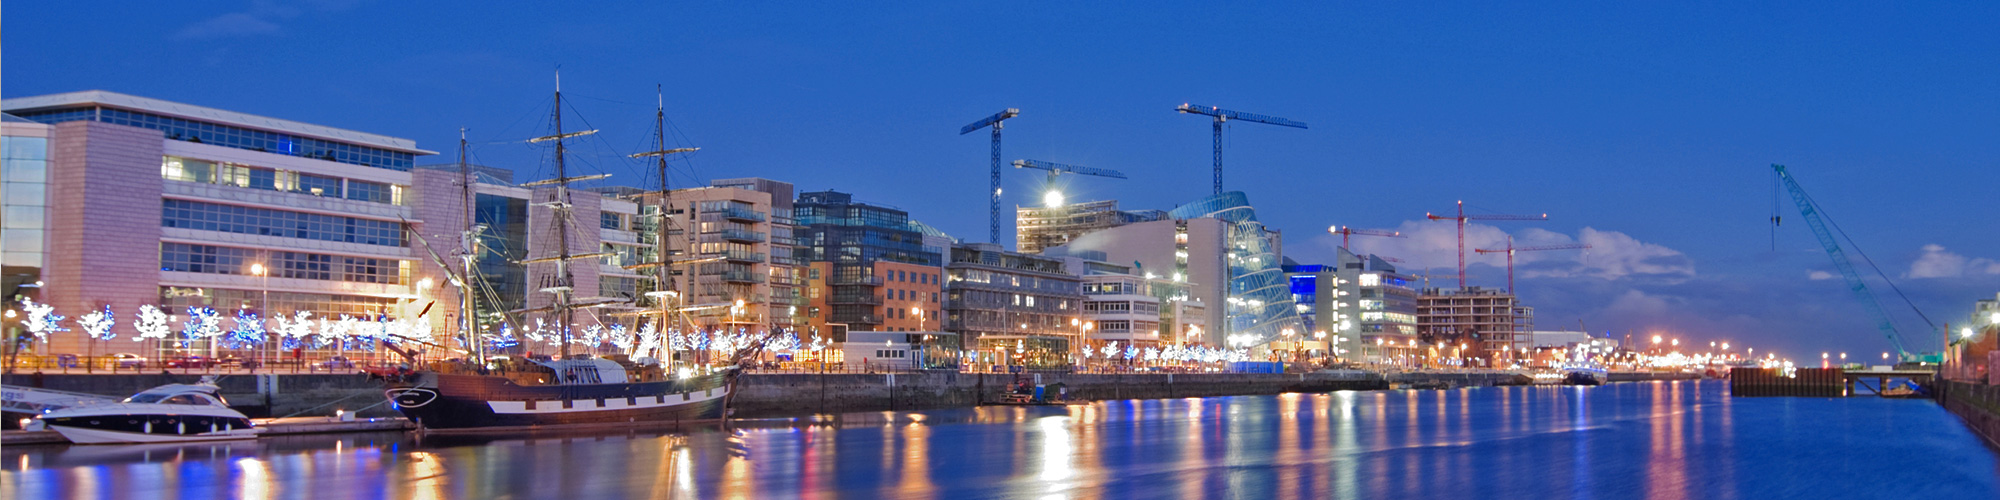 Verde - Dublin Docklands